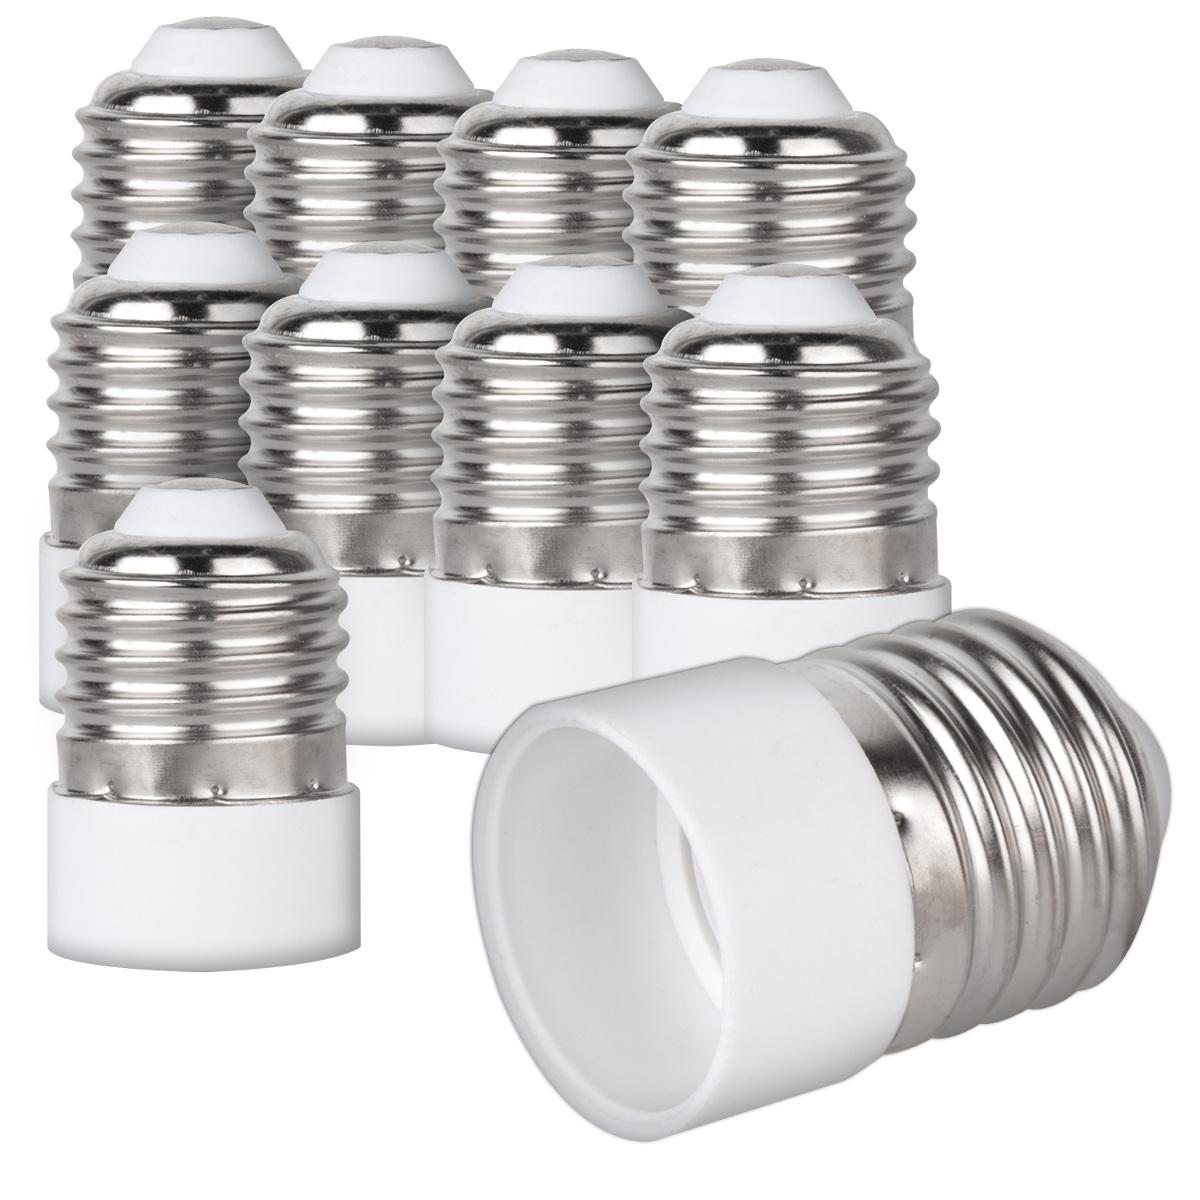 Energiespar Lampen Halogen- kwmobile 4x Lampensockel Adapter Konverter E27 Fassung auf E14 Lampensockel f/ür LED-